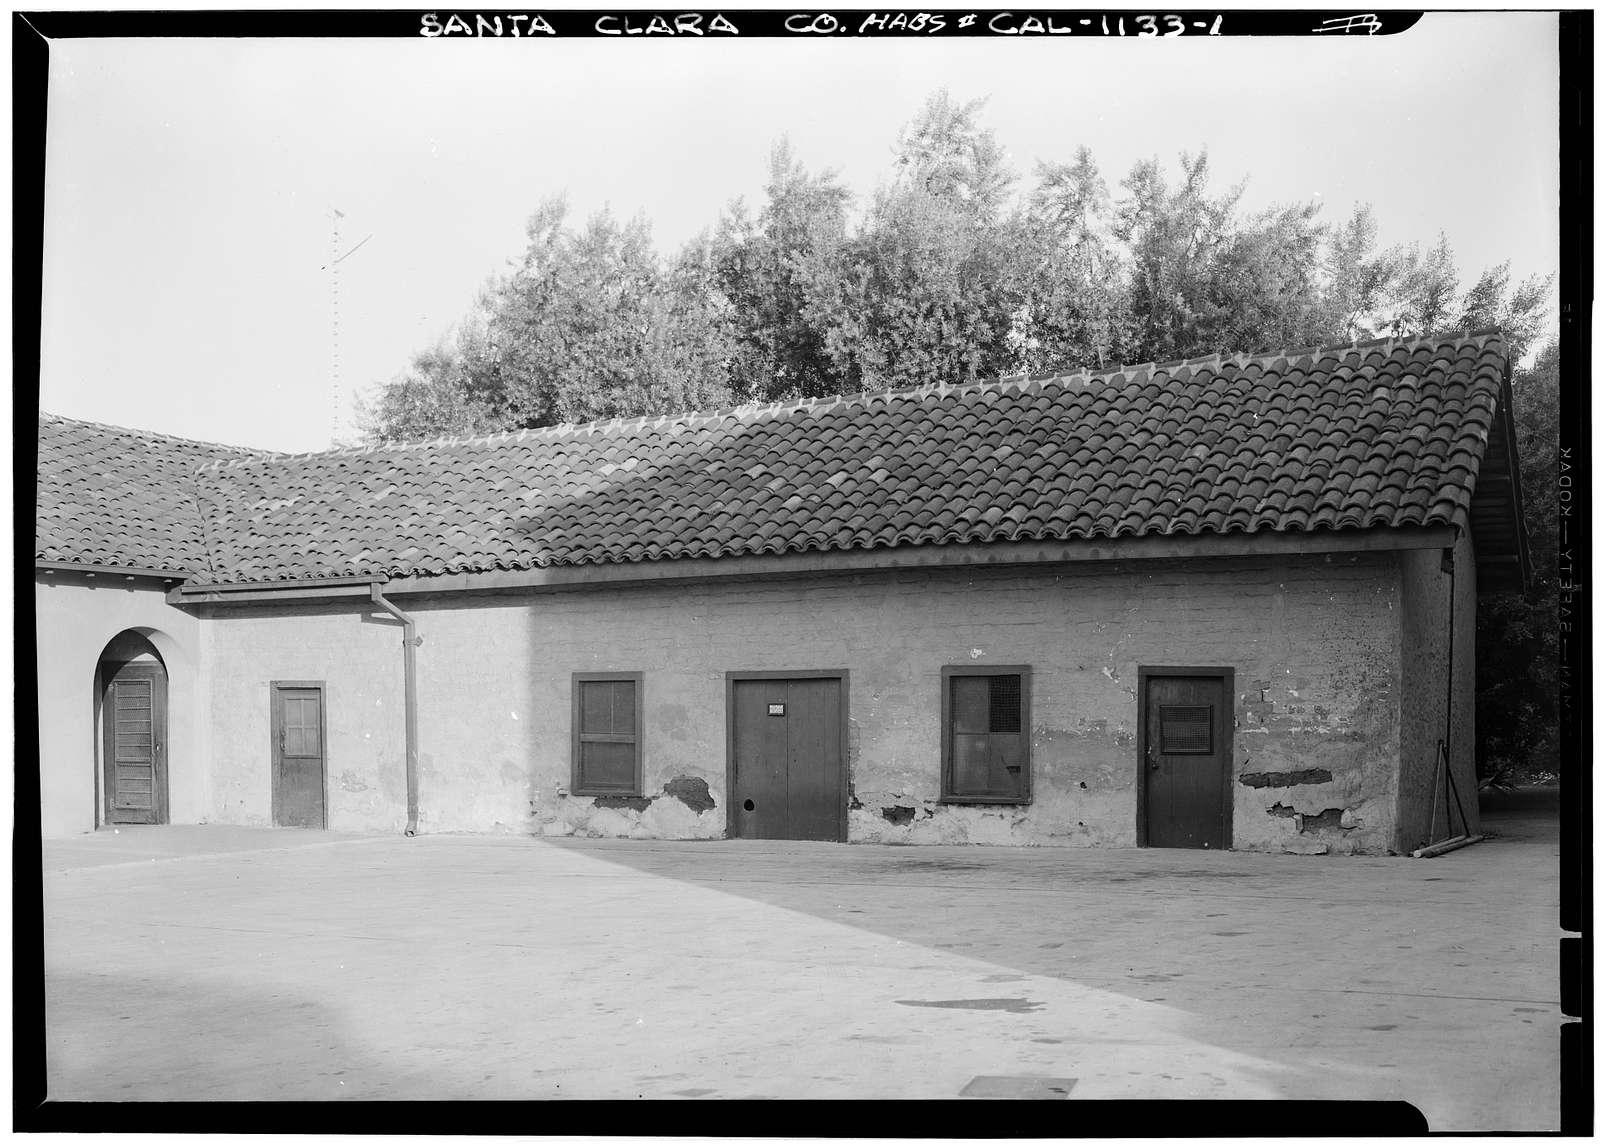 Mission Santa Clara de Asis, Franklin & Grant Streets, Santa Clara, Santa Clara County, CA